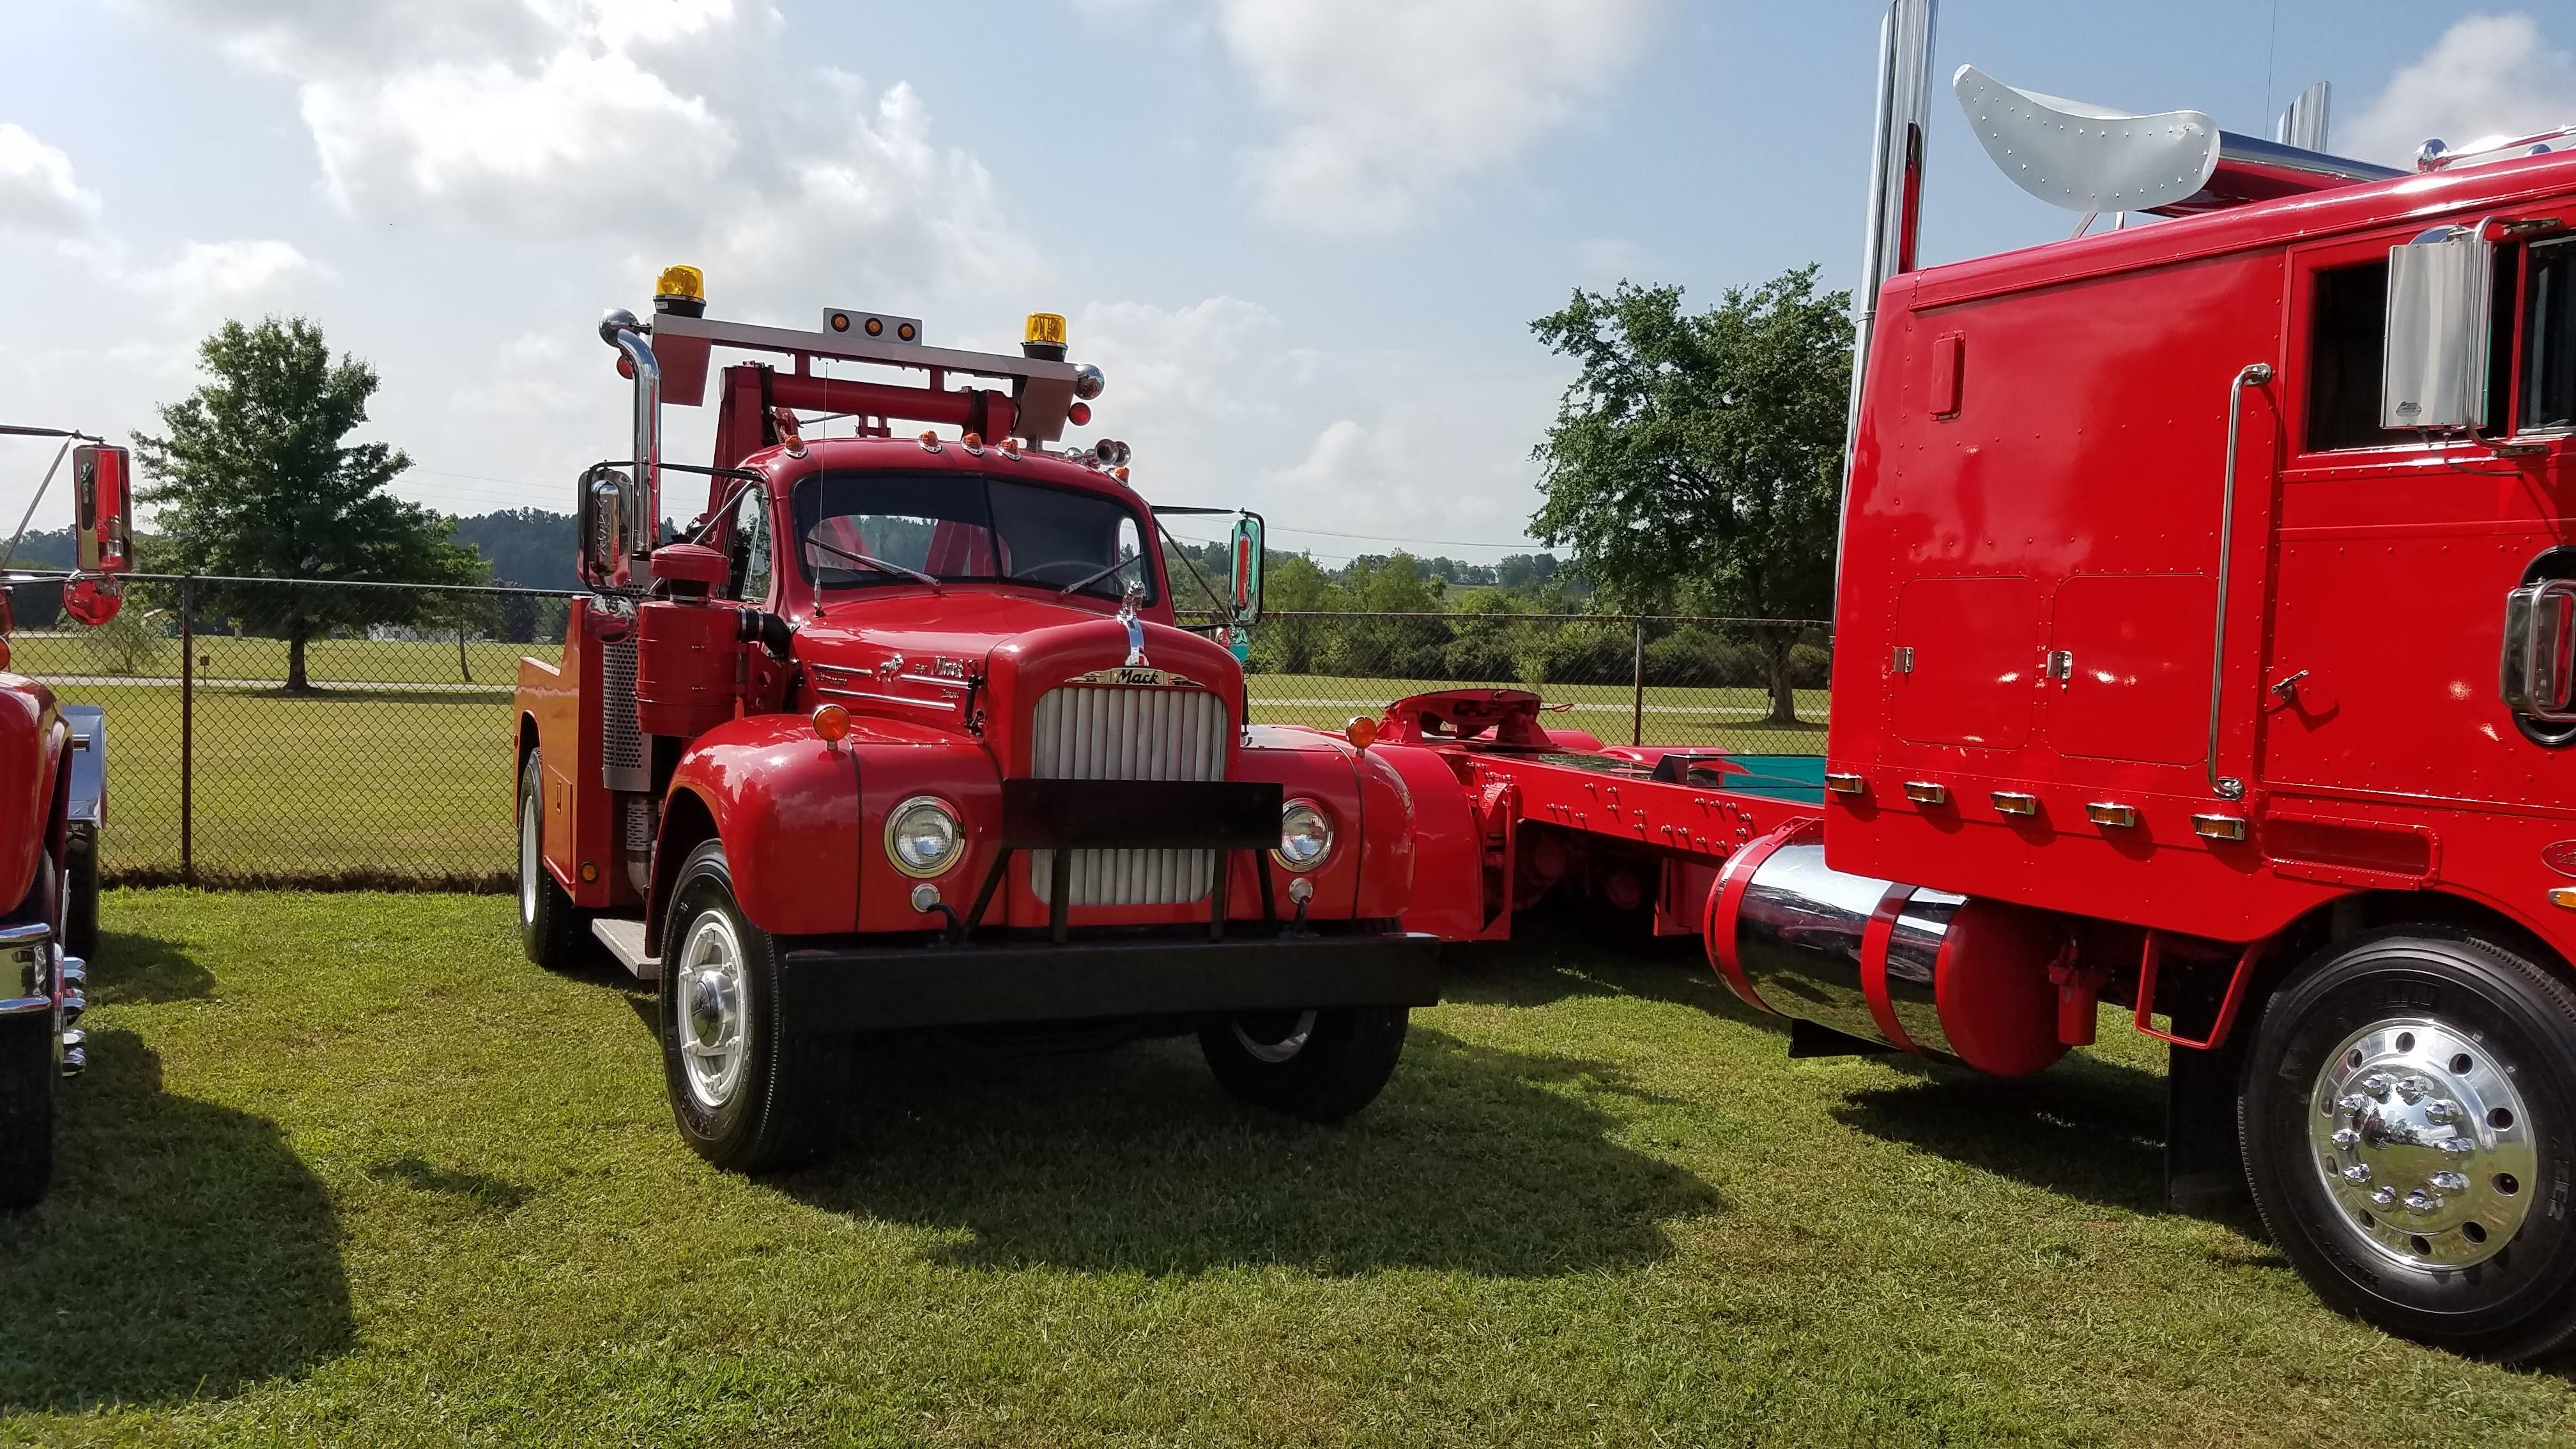 Mack Truck June 2017 E7 350 Engine Diagram Photos Of Watts Show